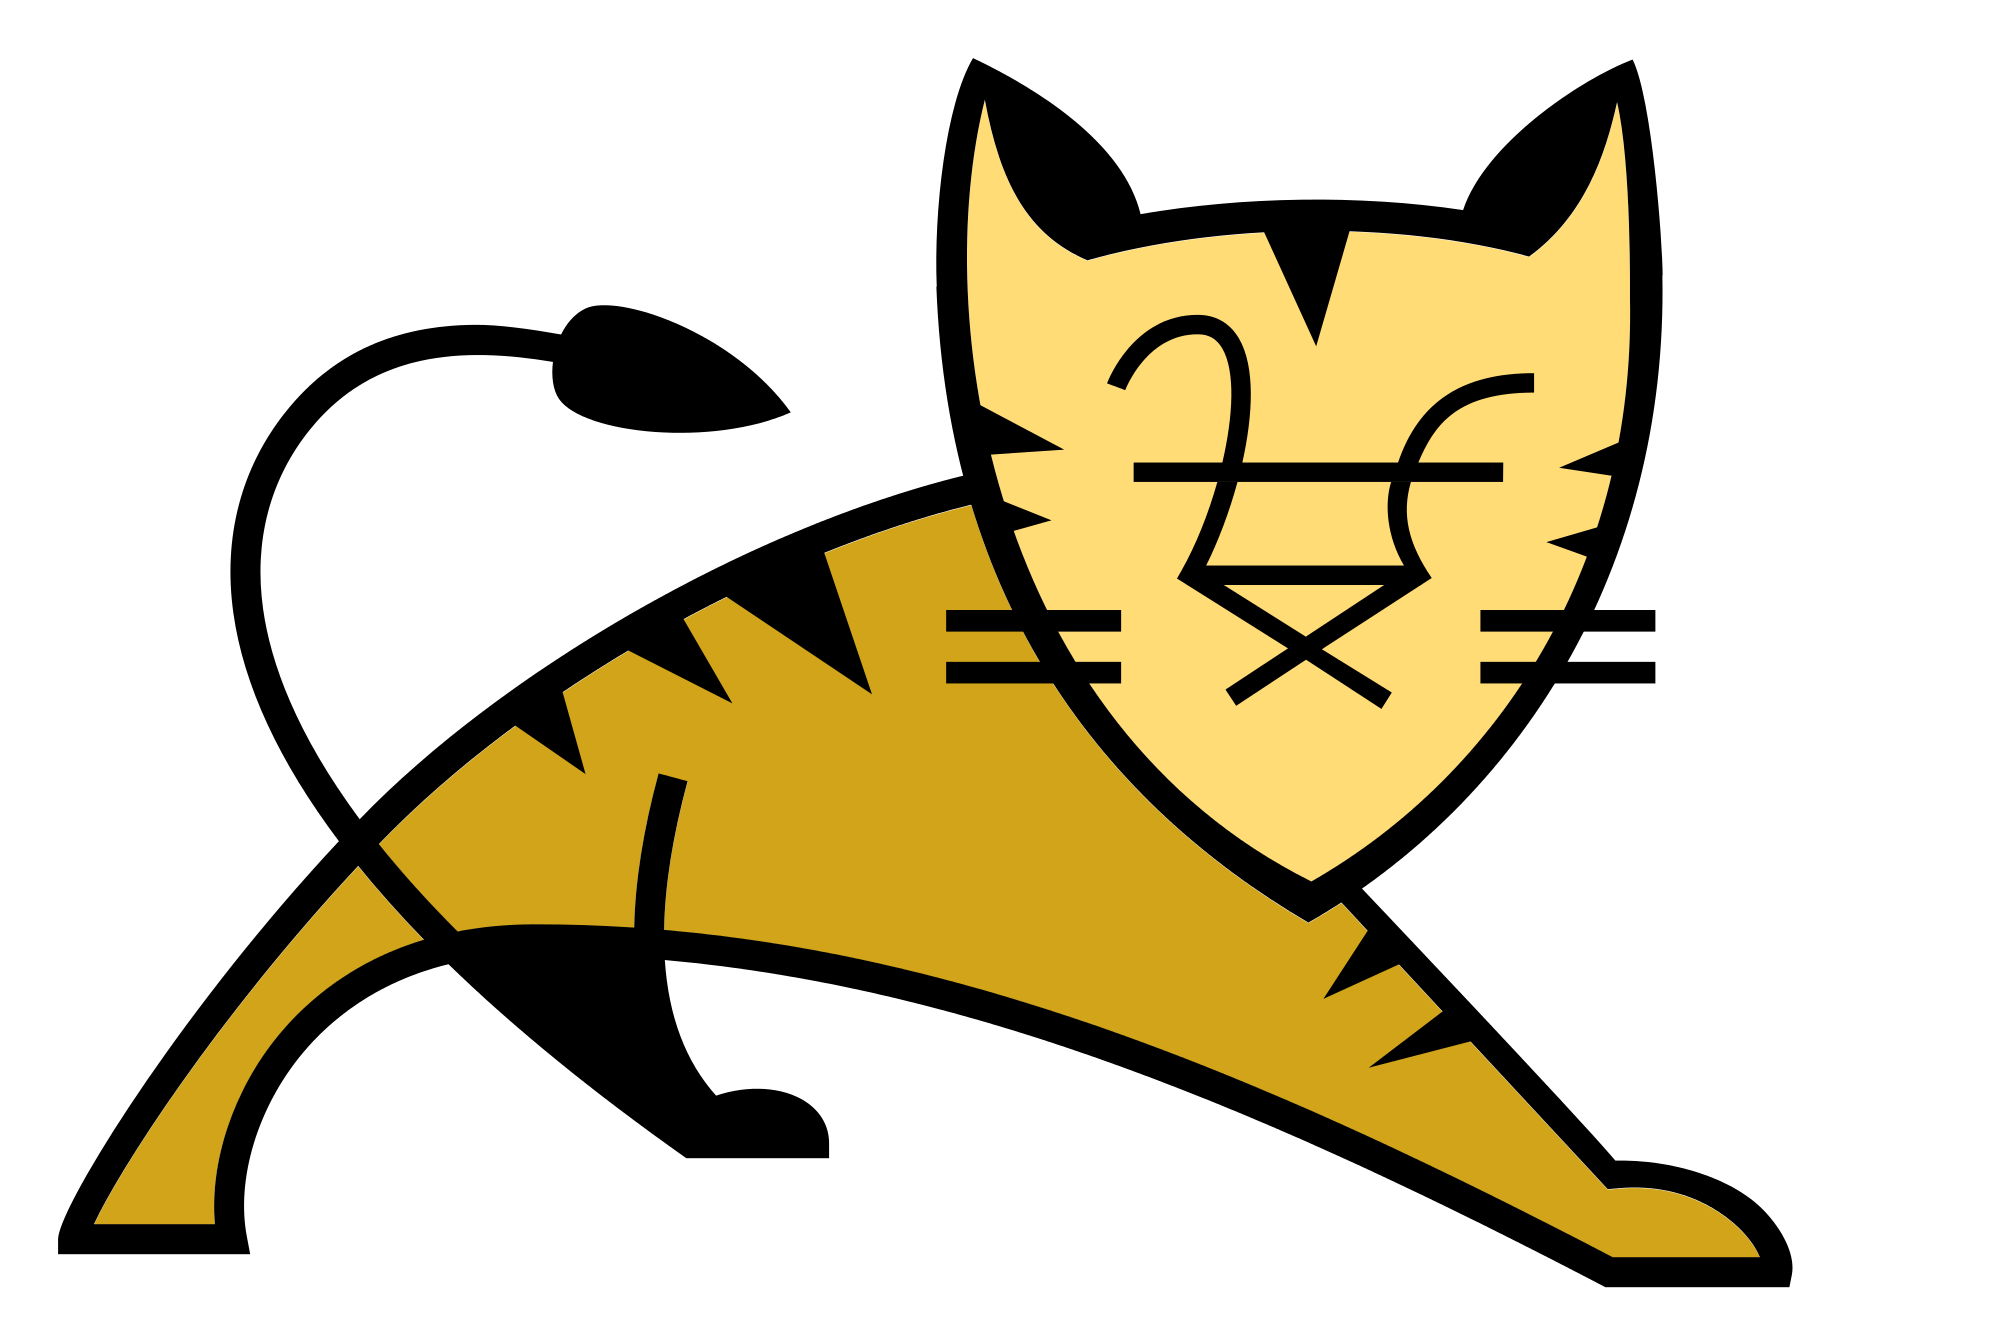 File:Tomcat.